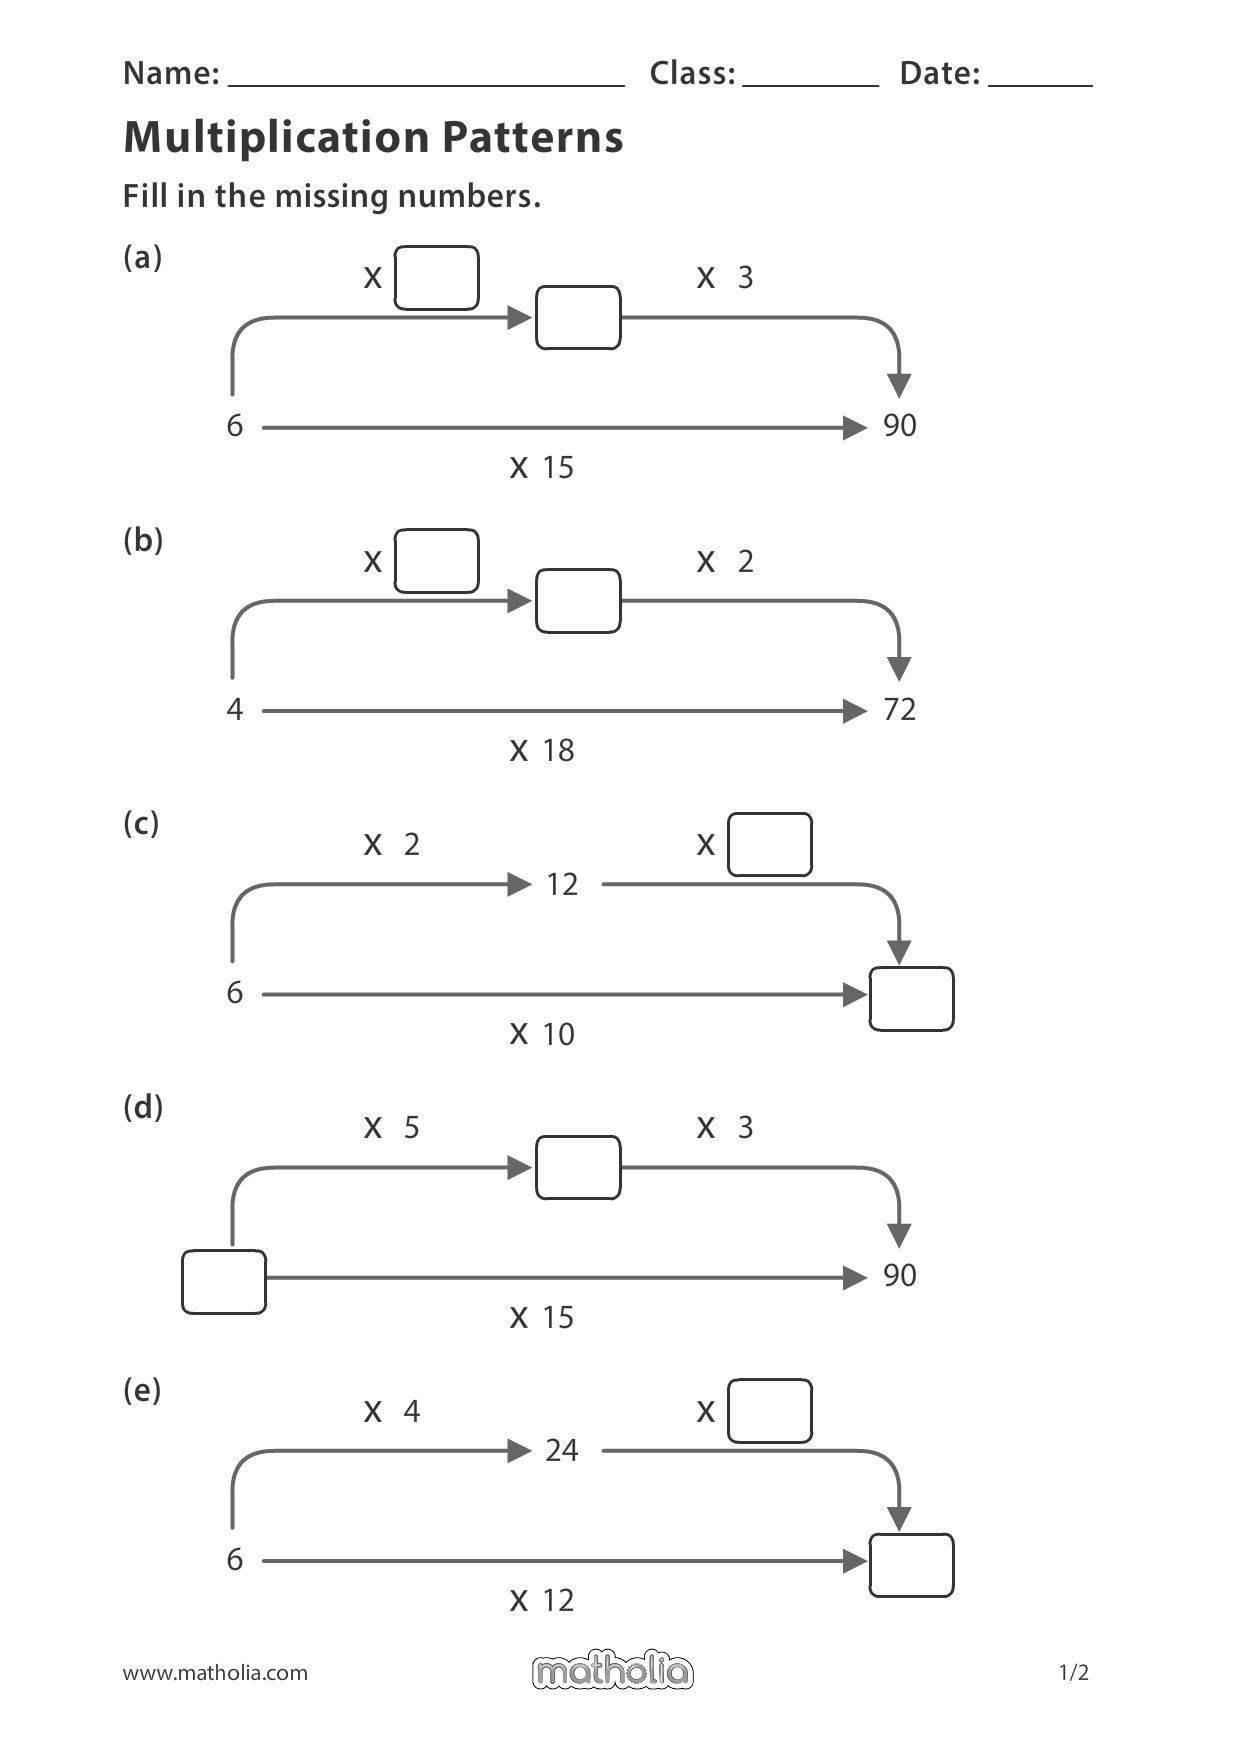 Multiplication Patterns In